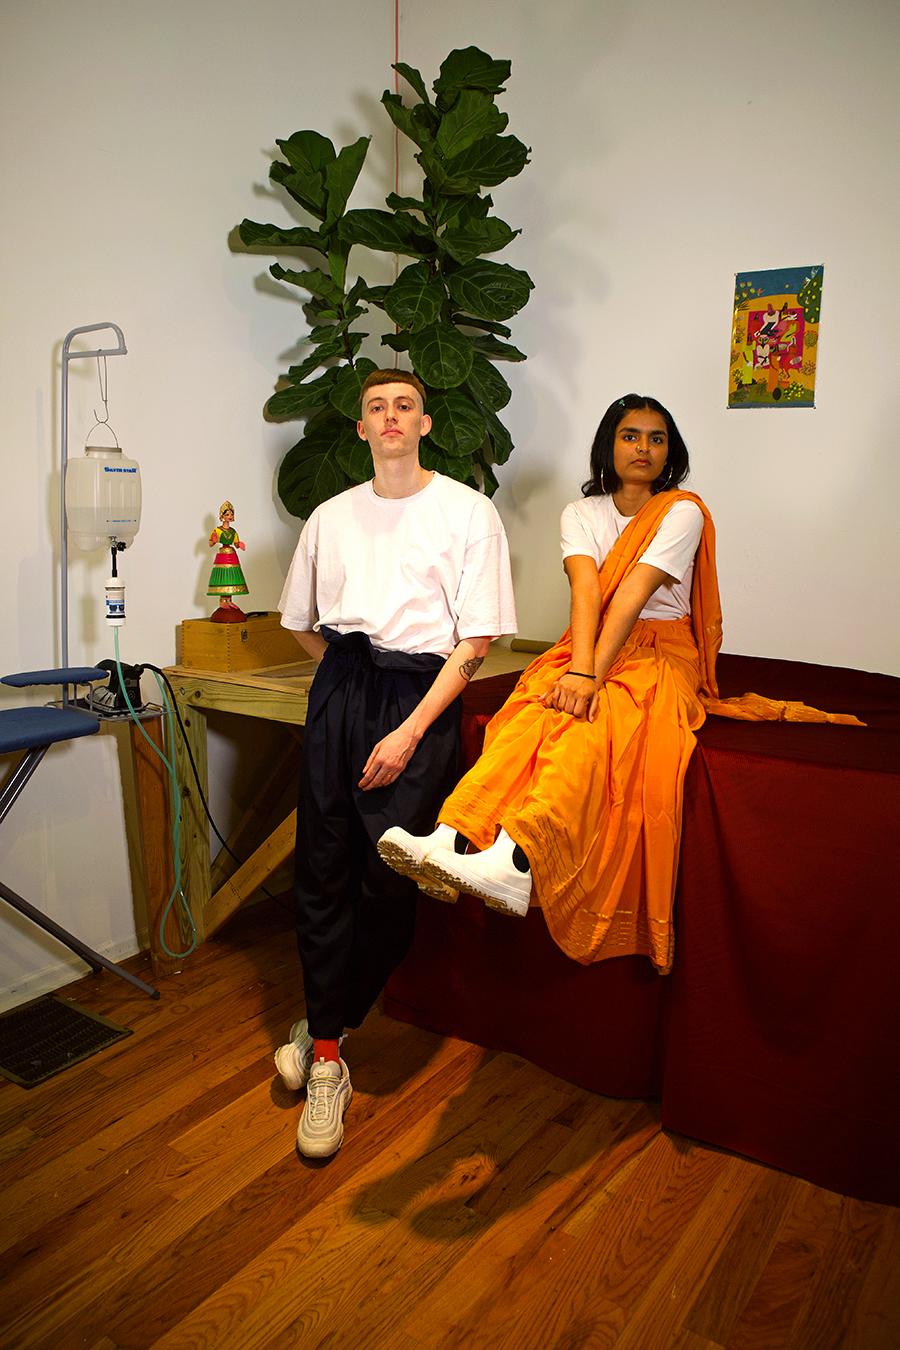 Miles Jackson and Vihanga Sontam